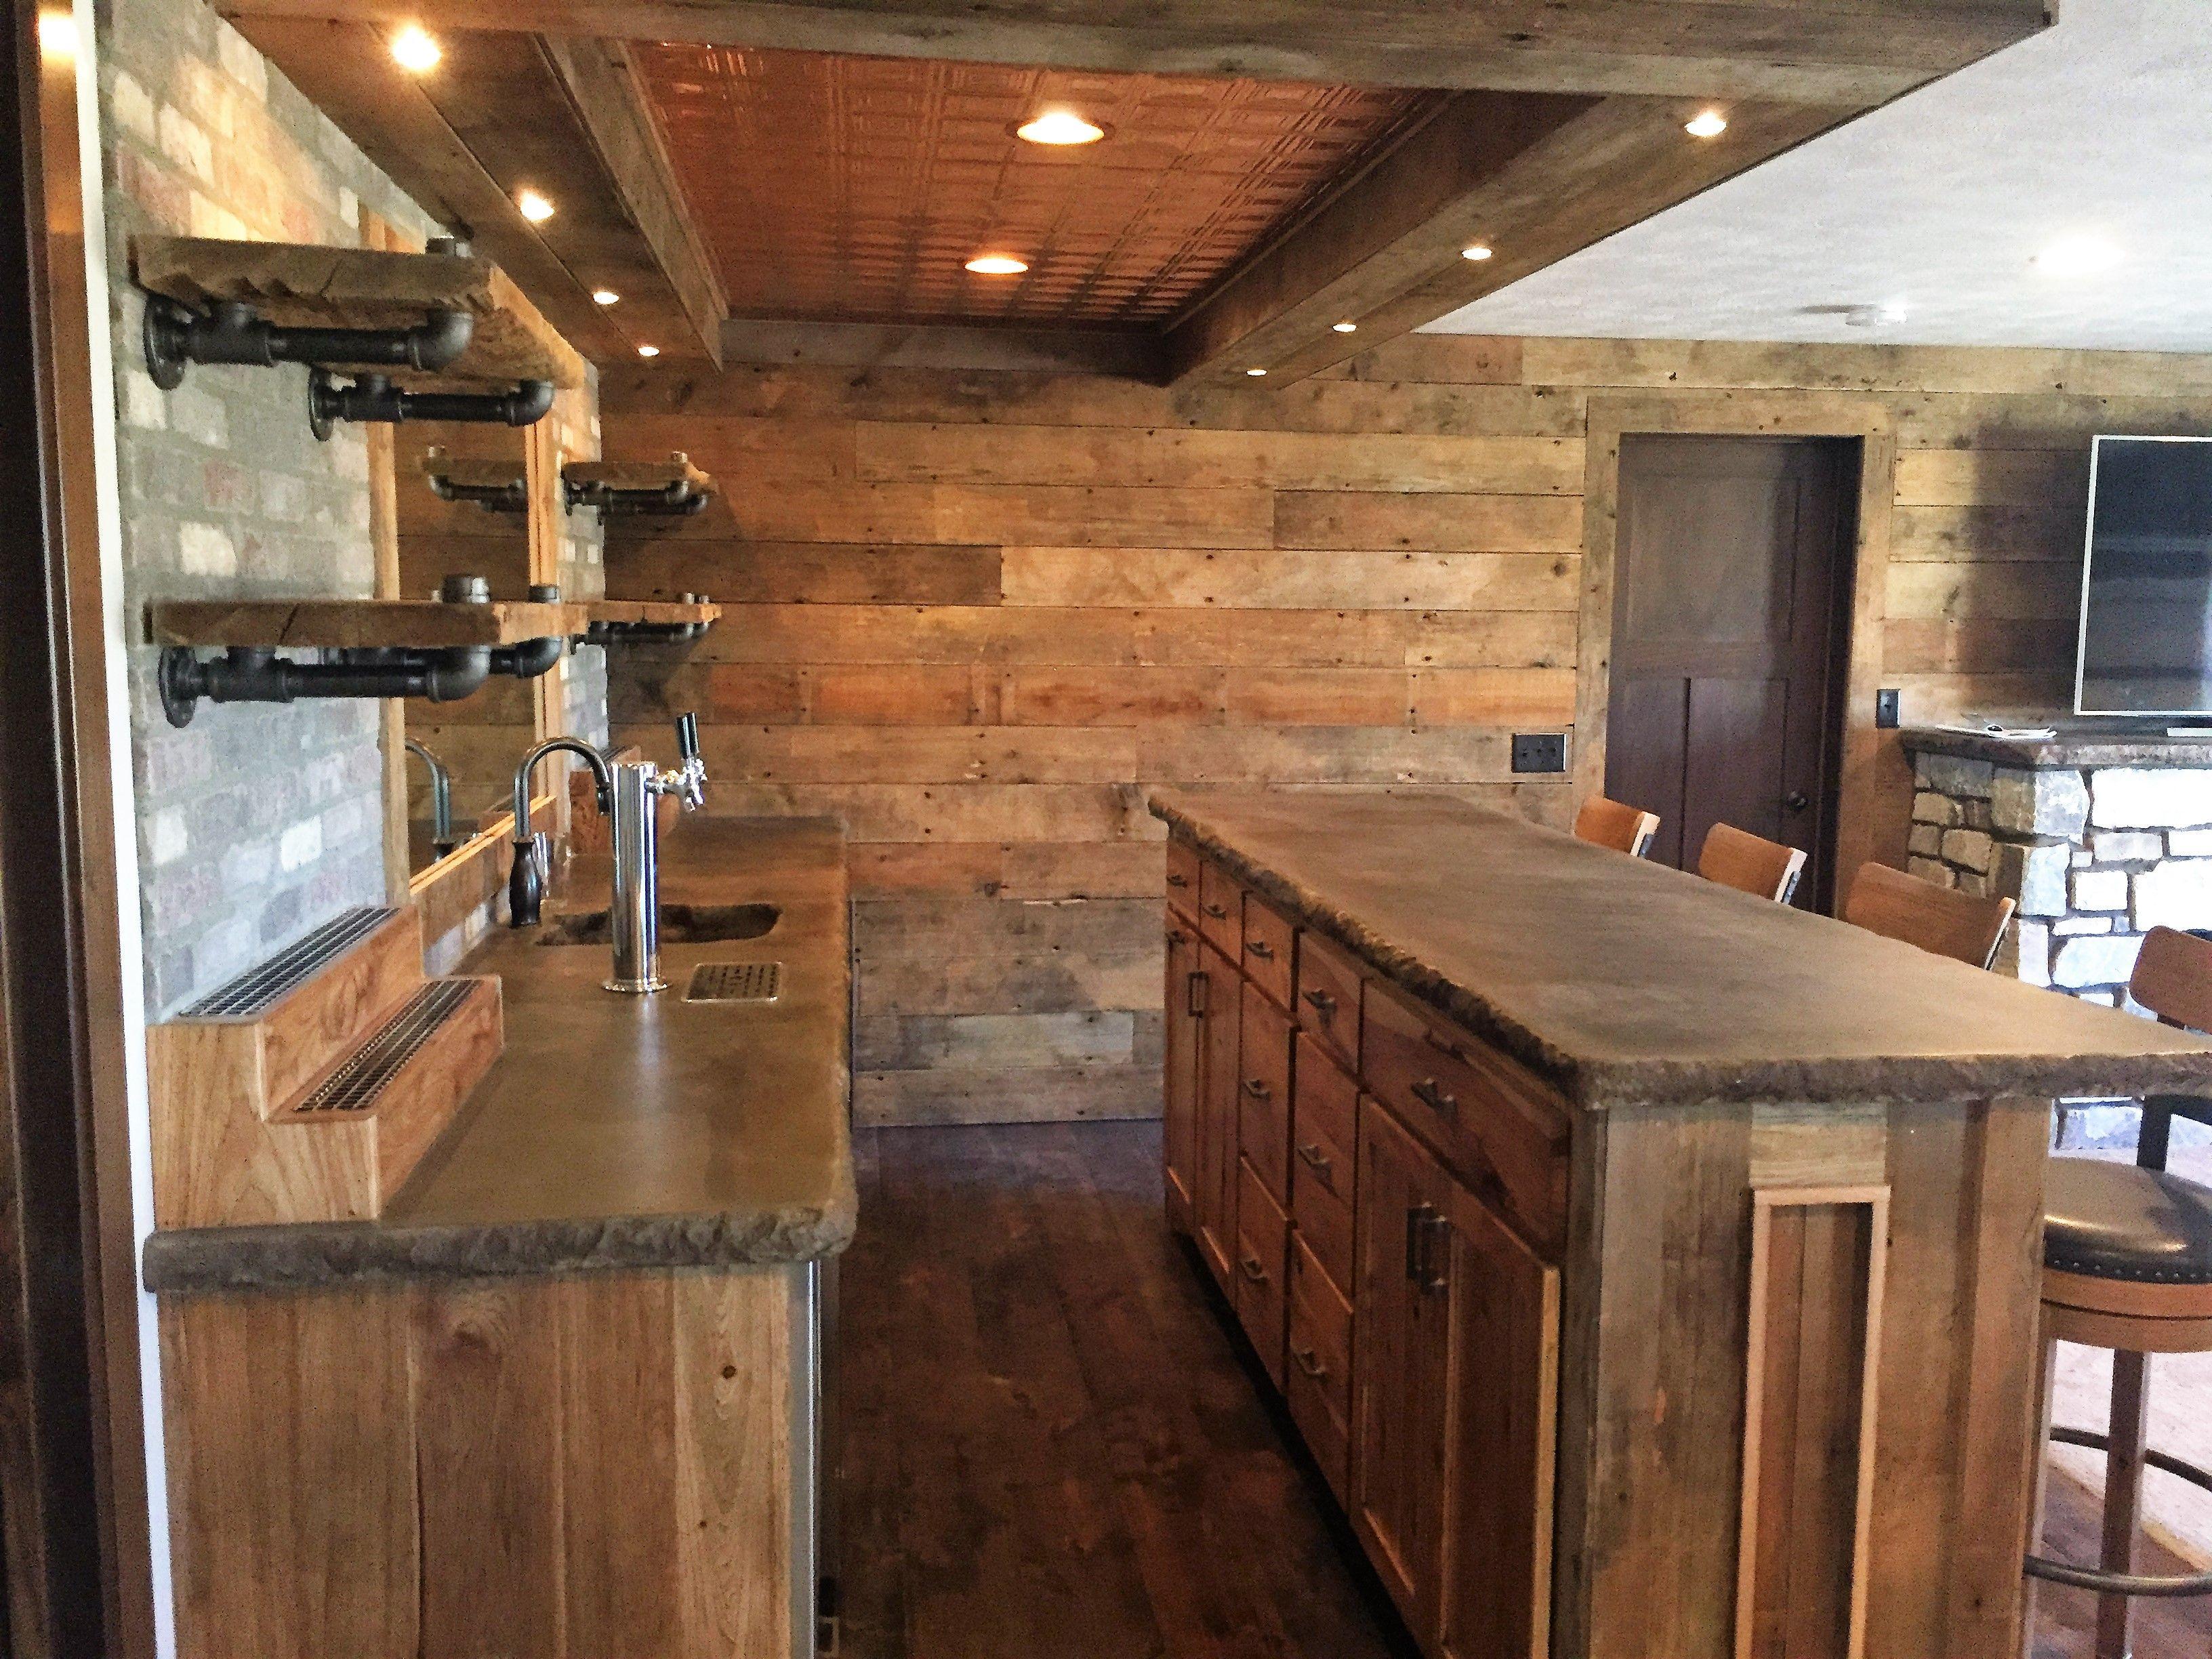 Rustic Basement Bar Concrete Bar Top Copper Ceiling Tiles Brick